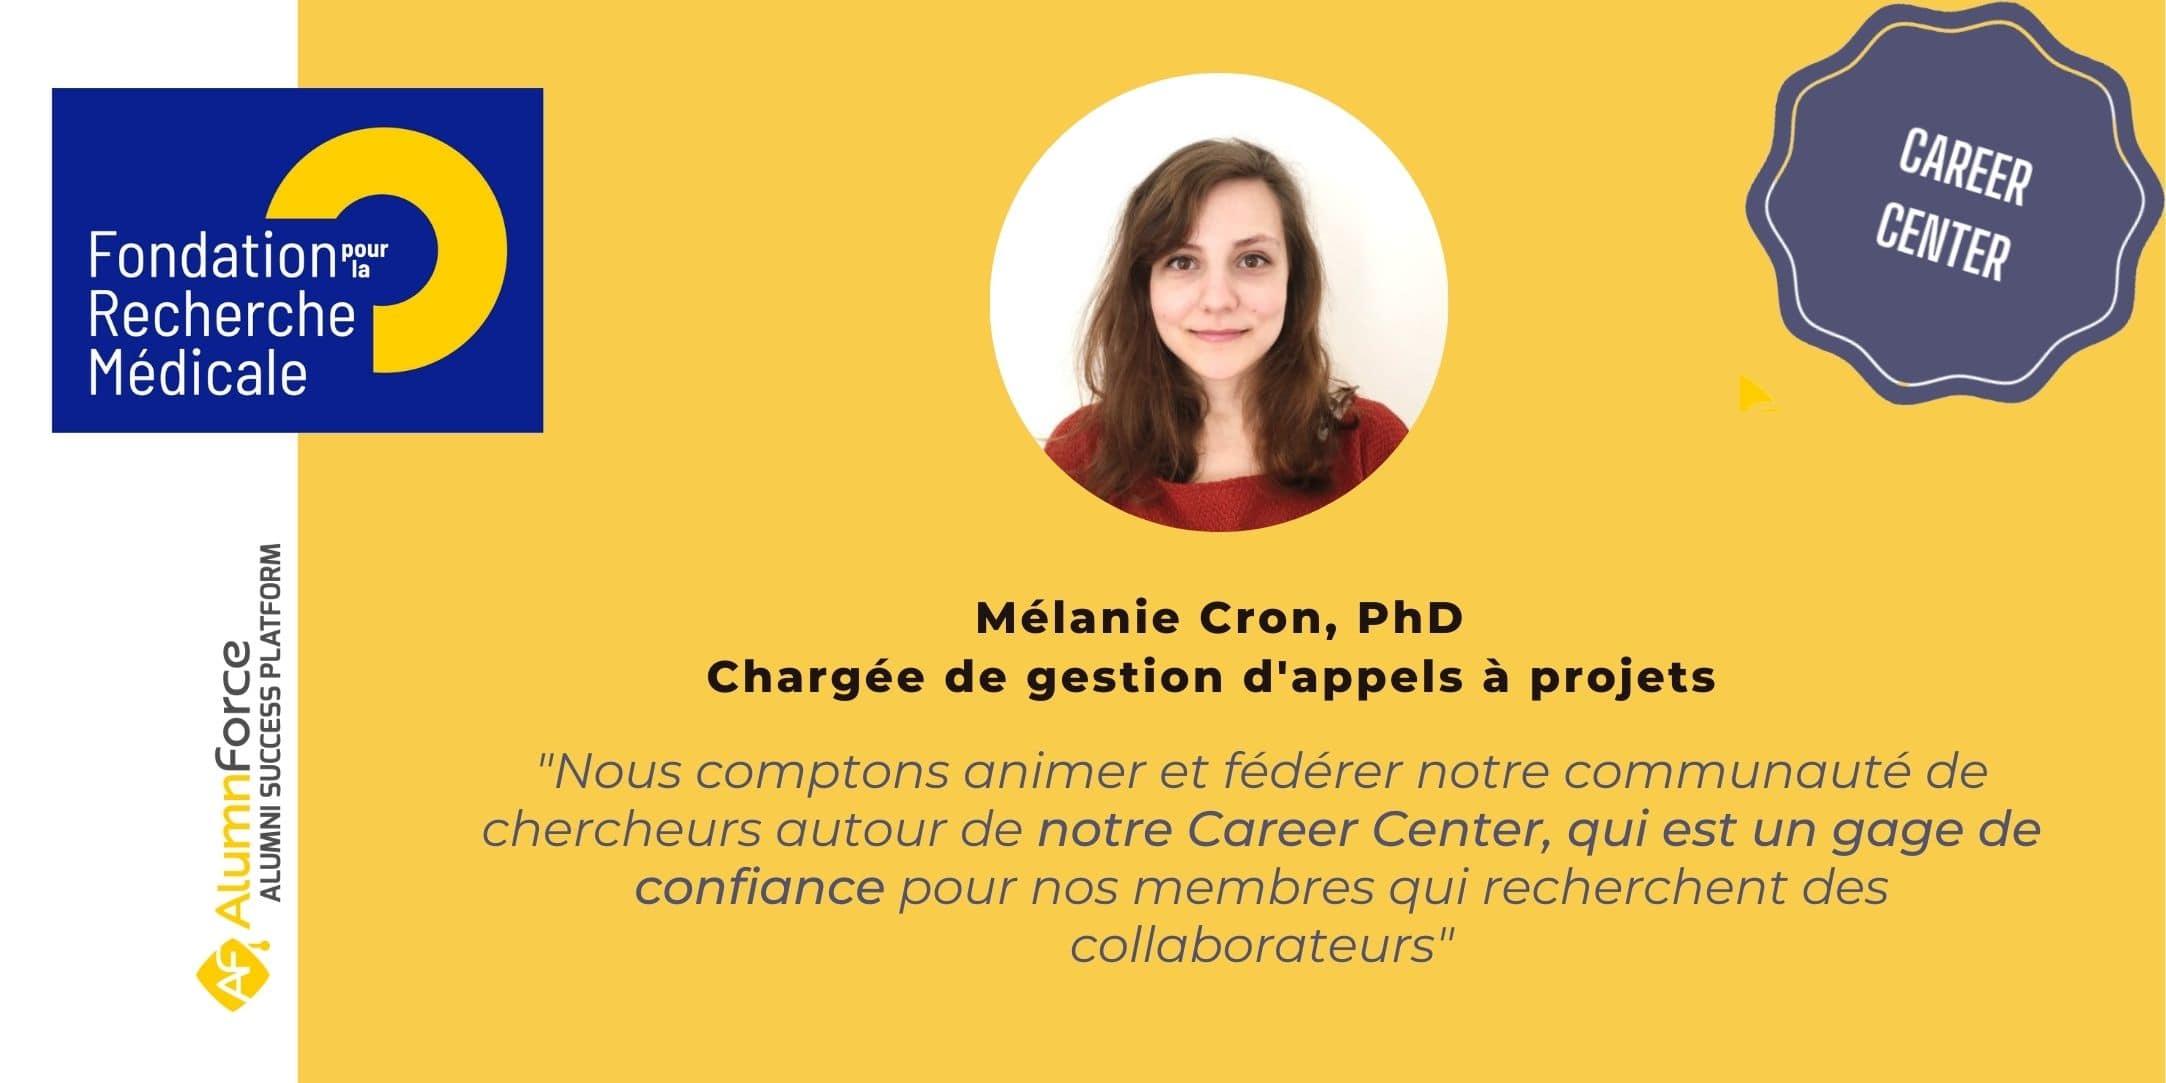 The Fondation pour la Recherche Médicale energizes the research sector thanks to its Career Center